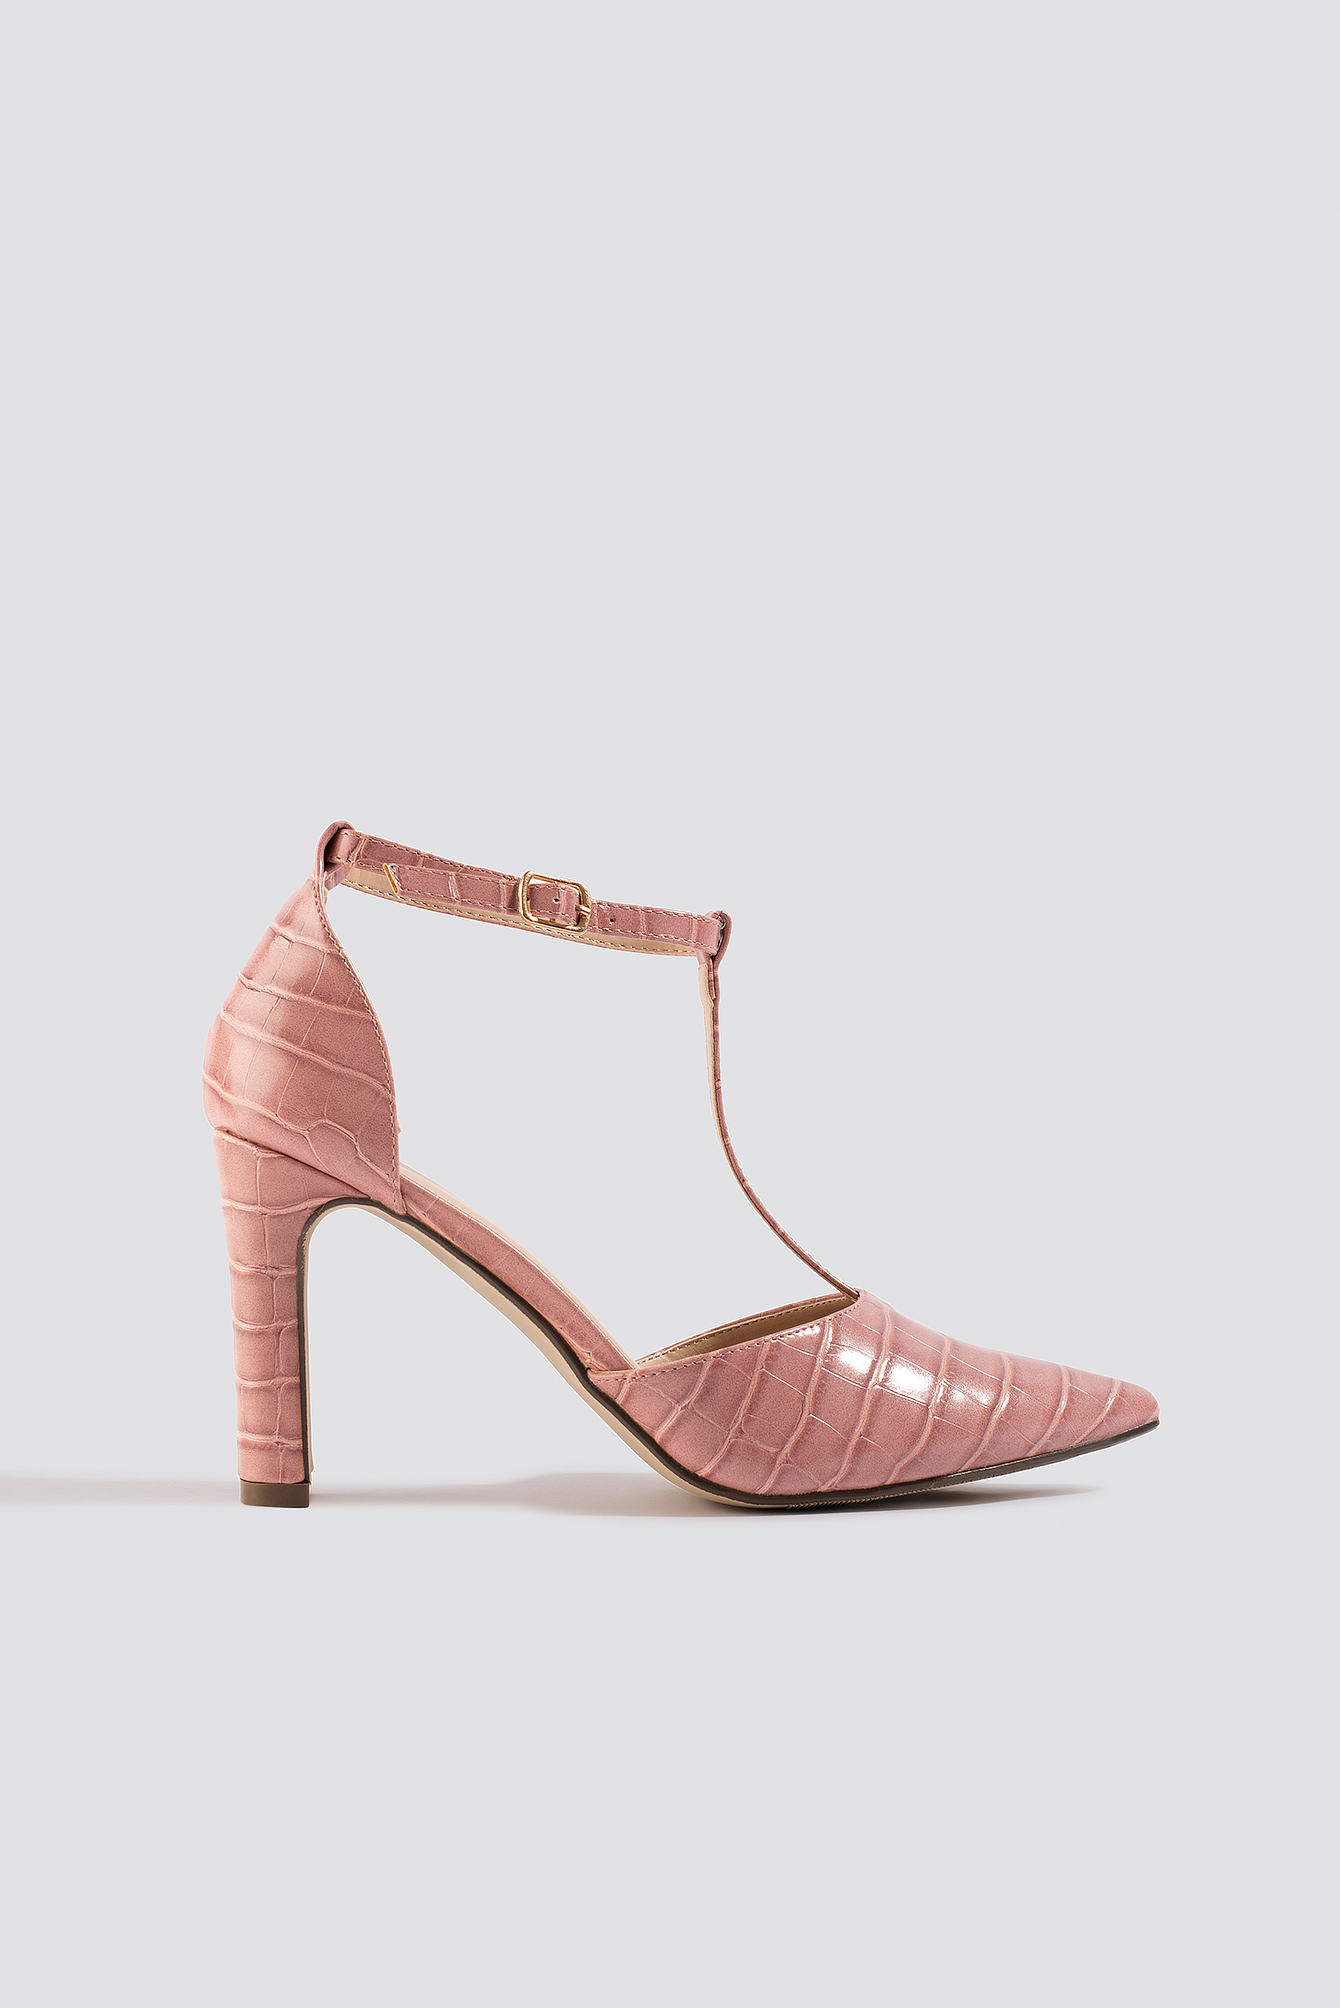 na-kd shoes -  Croco T Bar Pumps - Pink